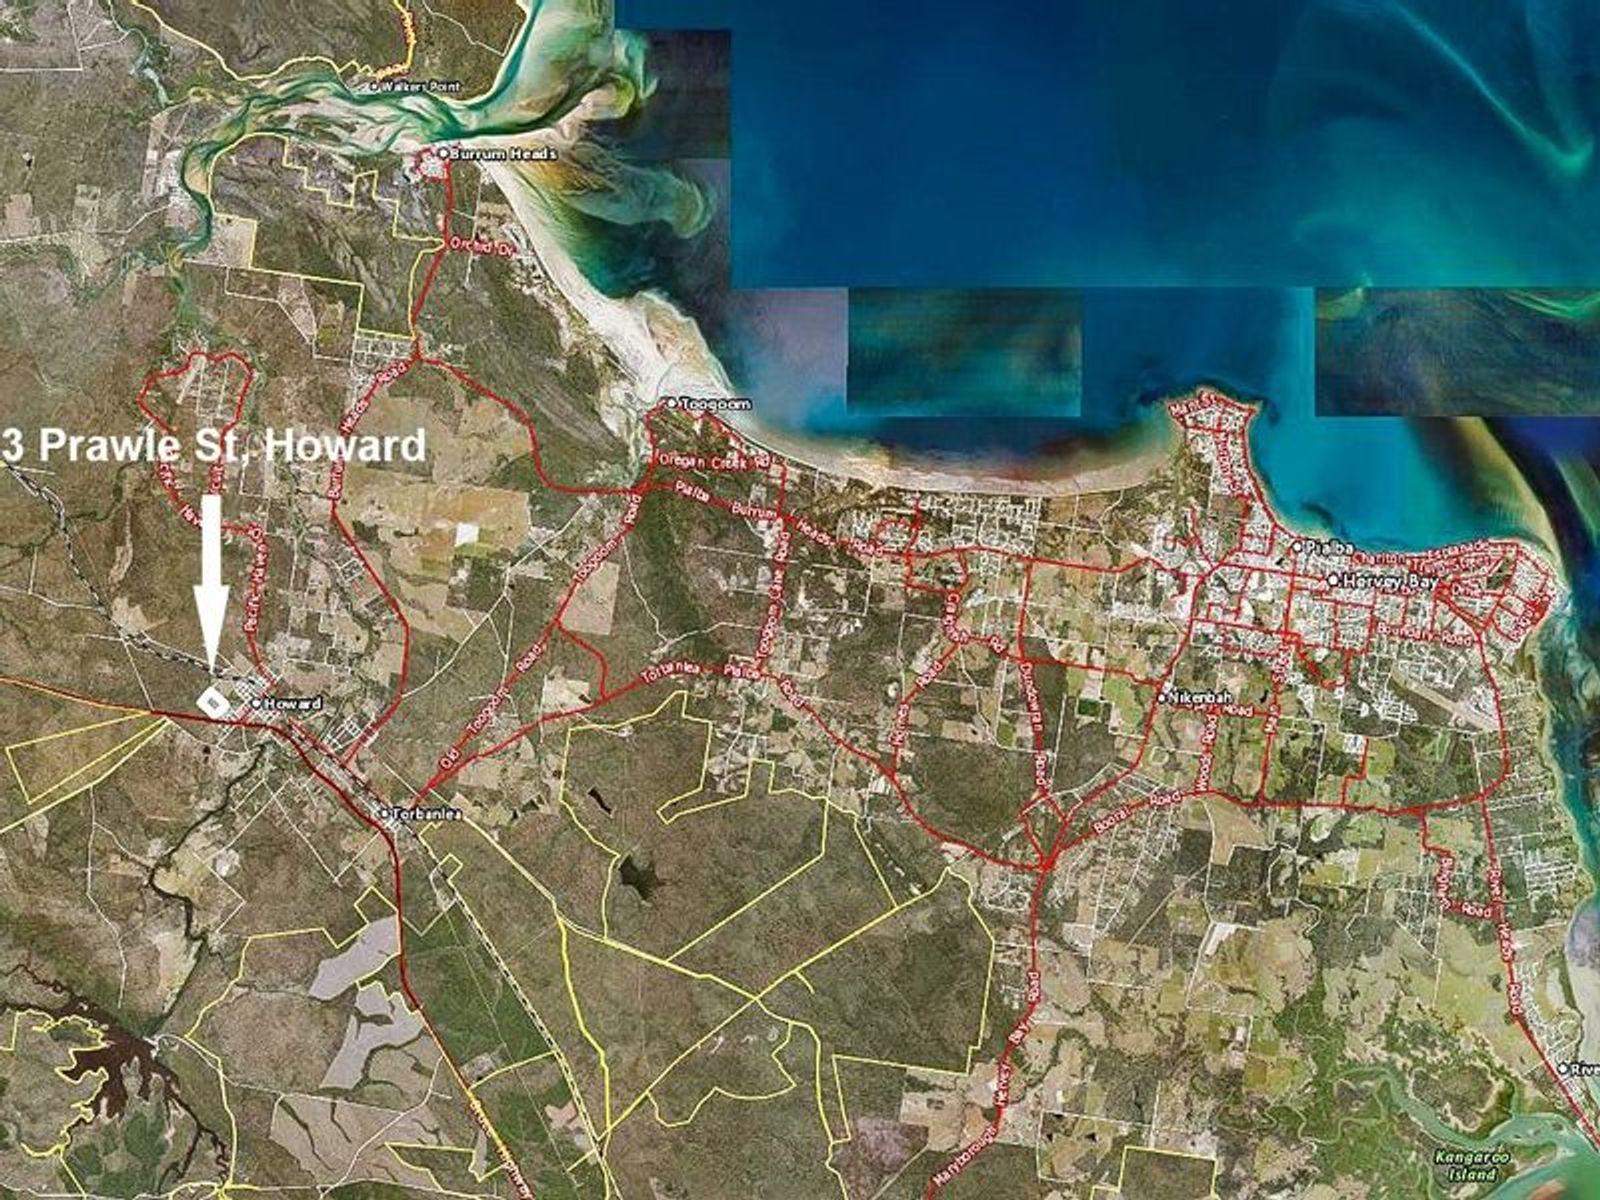 13 Prawle Street, Howard, QLD 4659